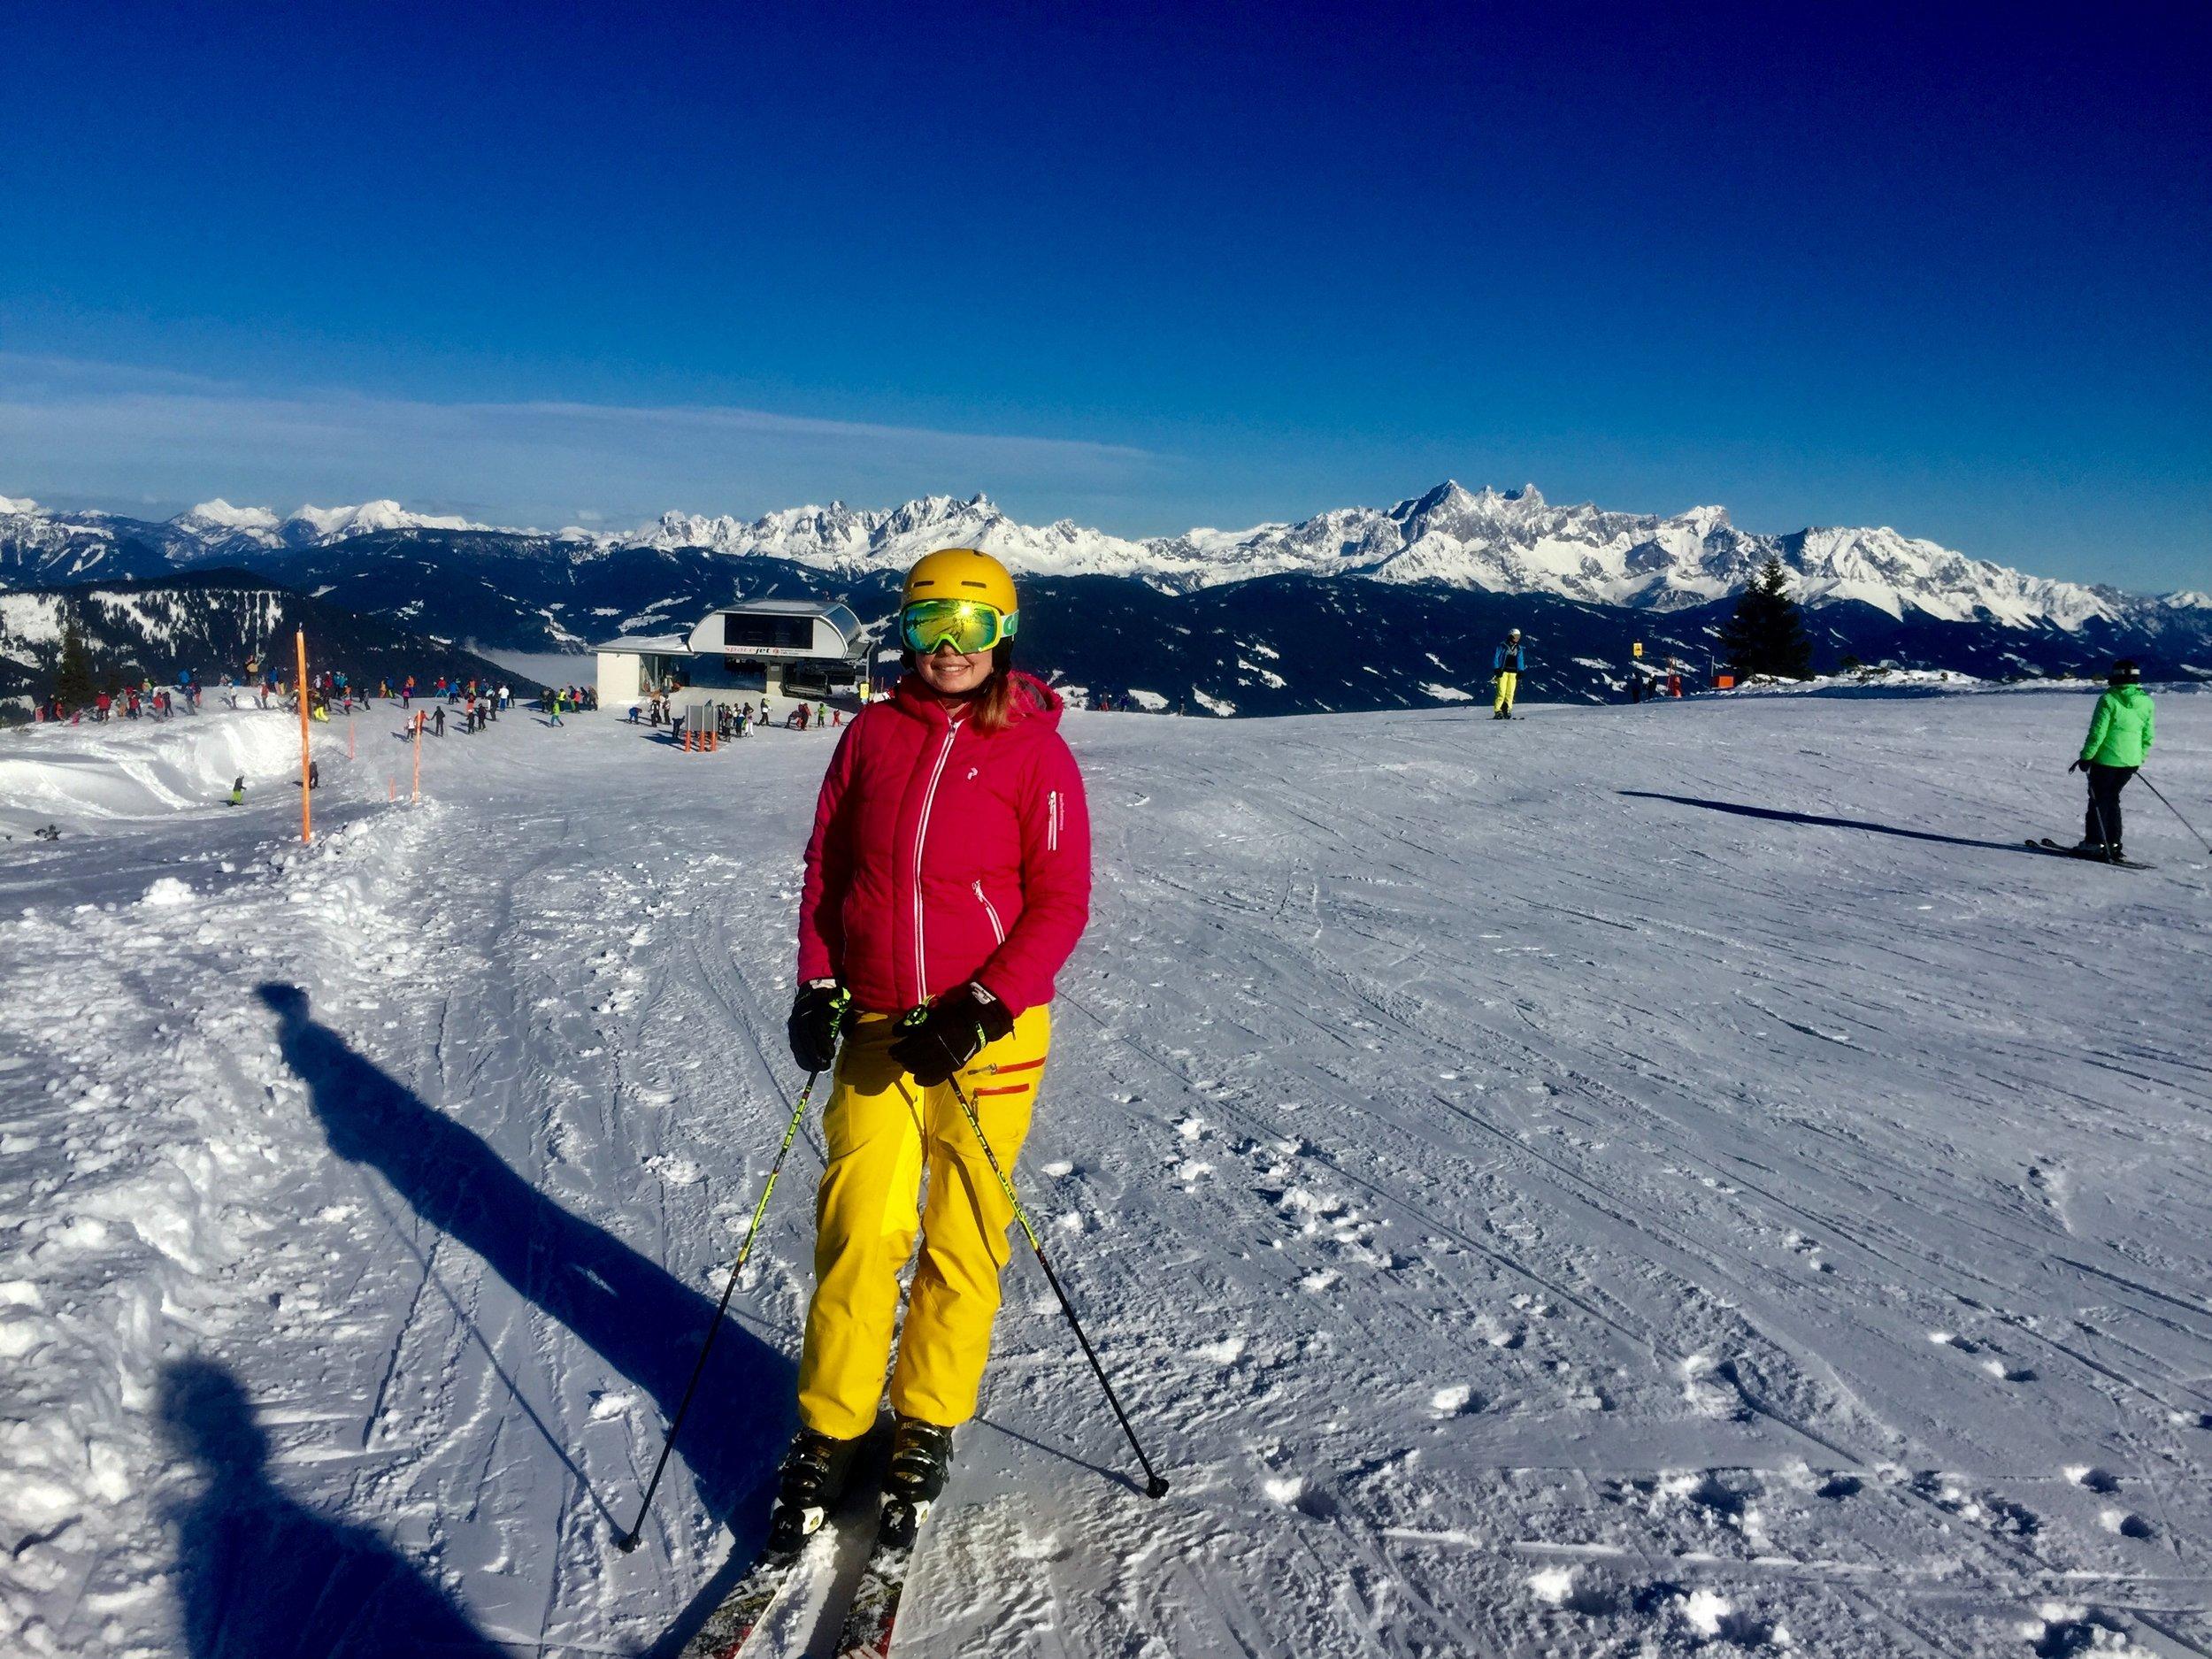 Gaby in the ski slope, Flachau 2017